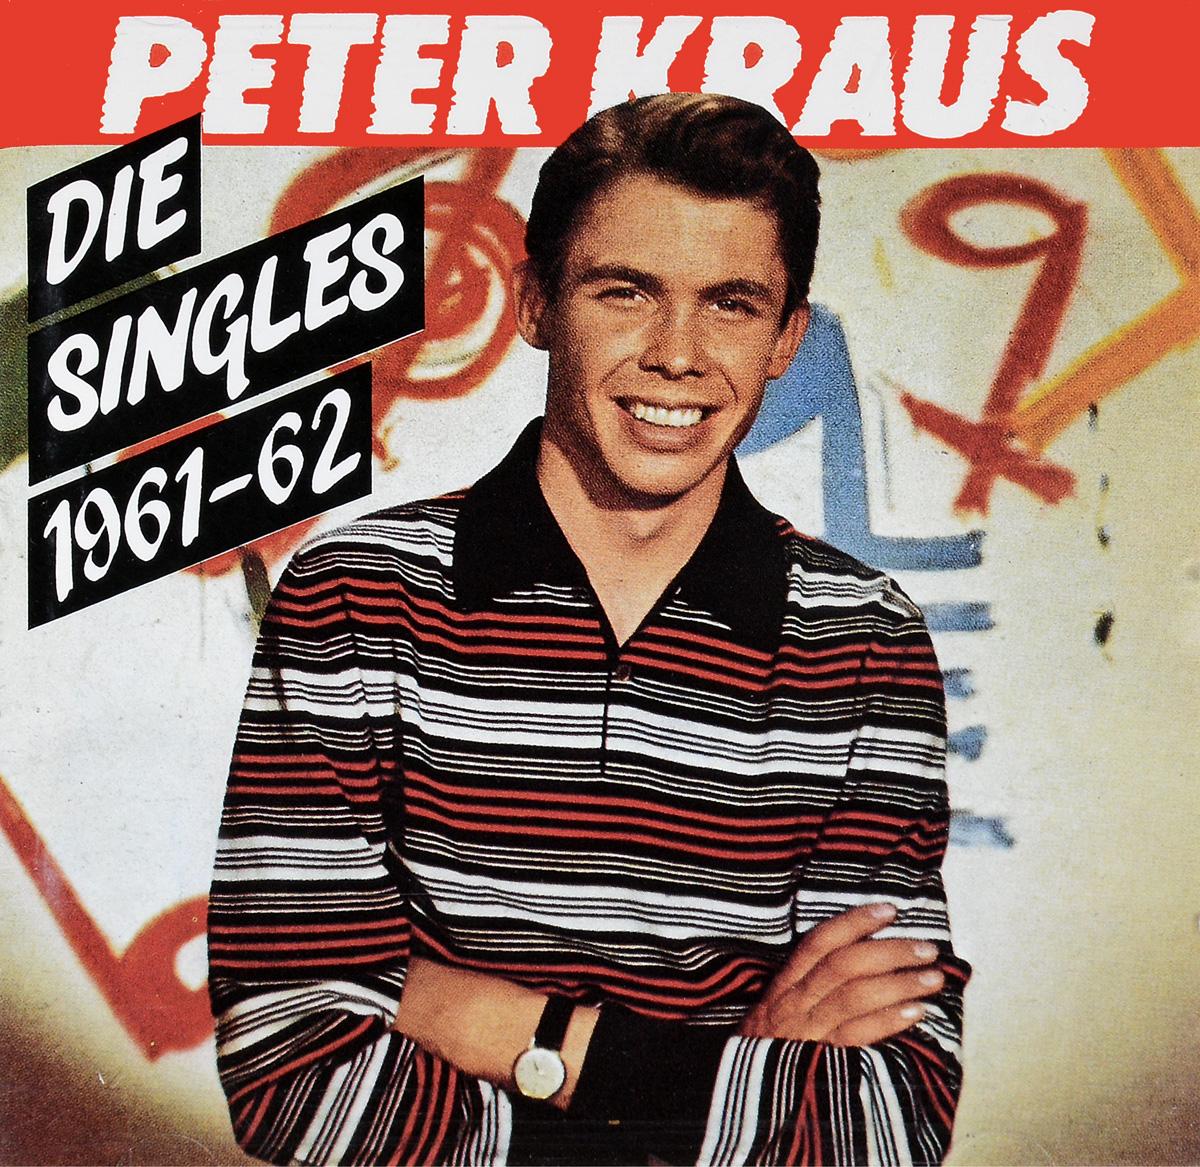 Peter Kraus. Singles 1961-62 (CD)